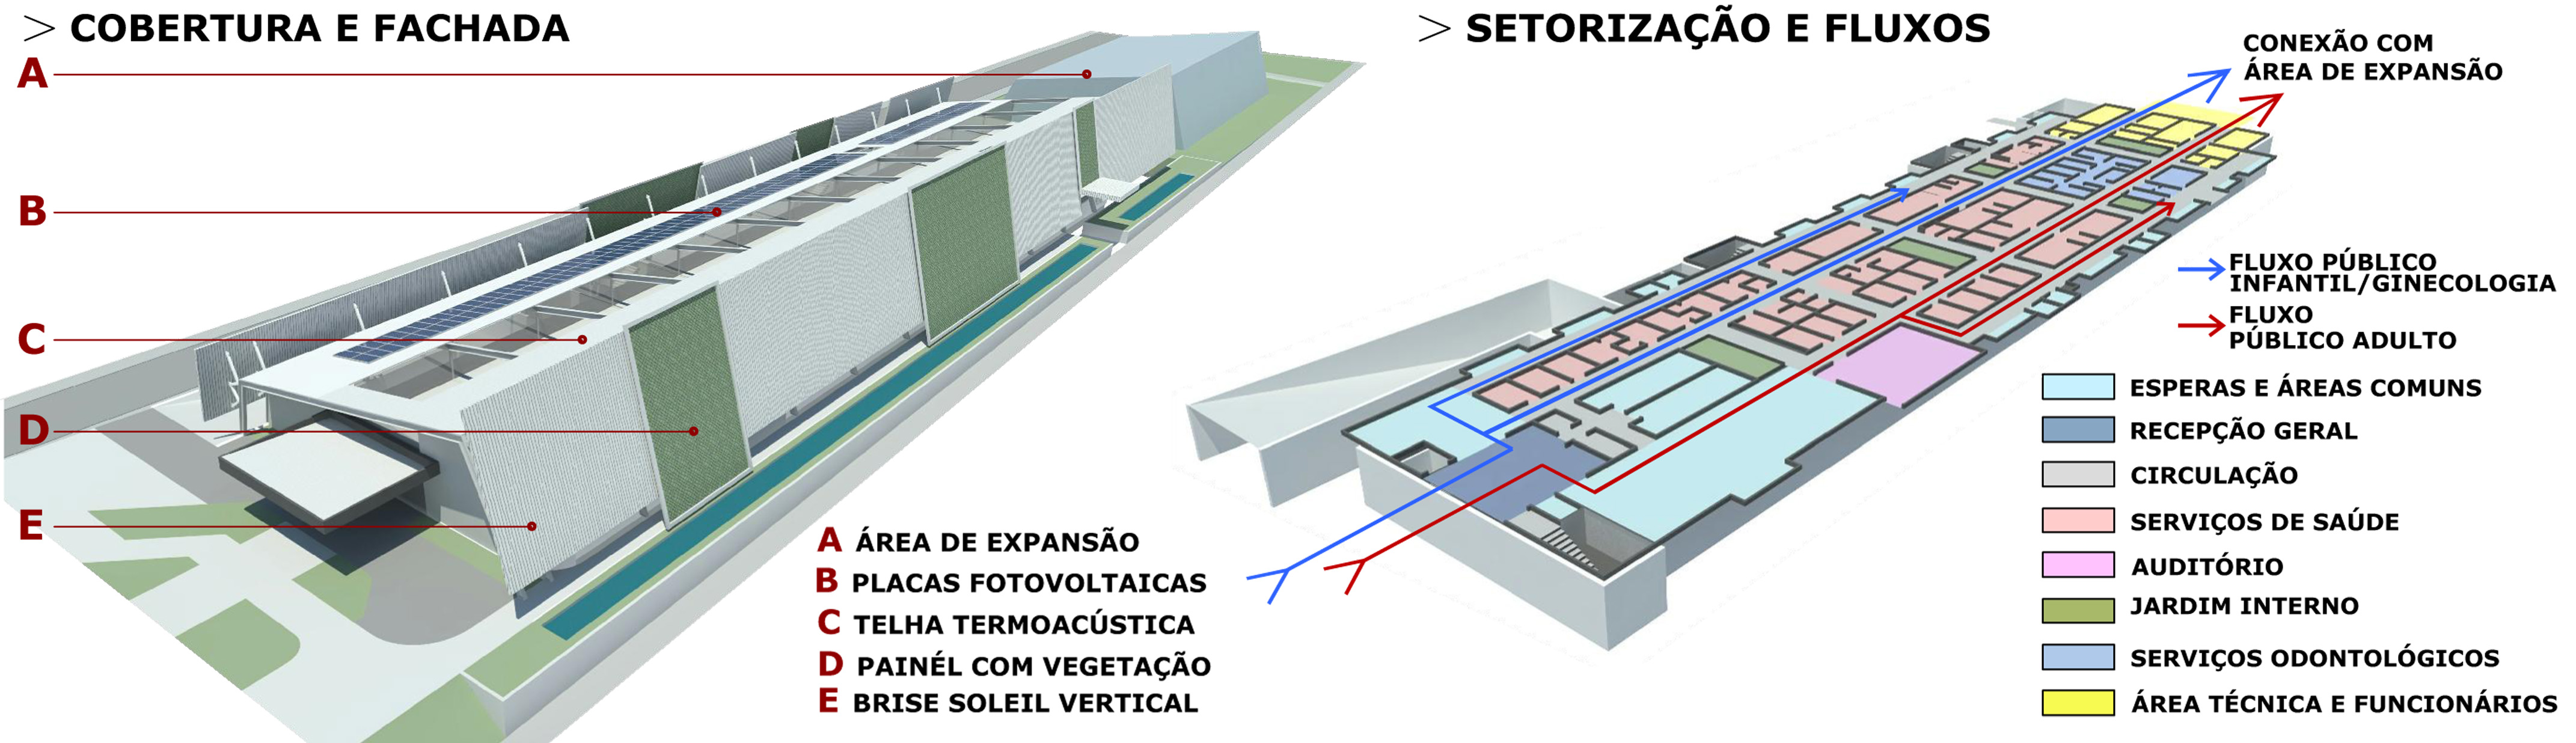 Resultado De Busca Sa De Giacomo Arquitetura -> Planta De Sala De Ordenha